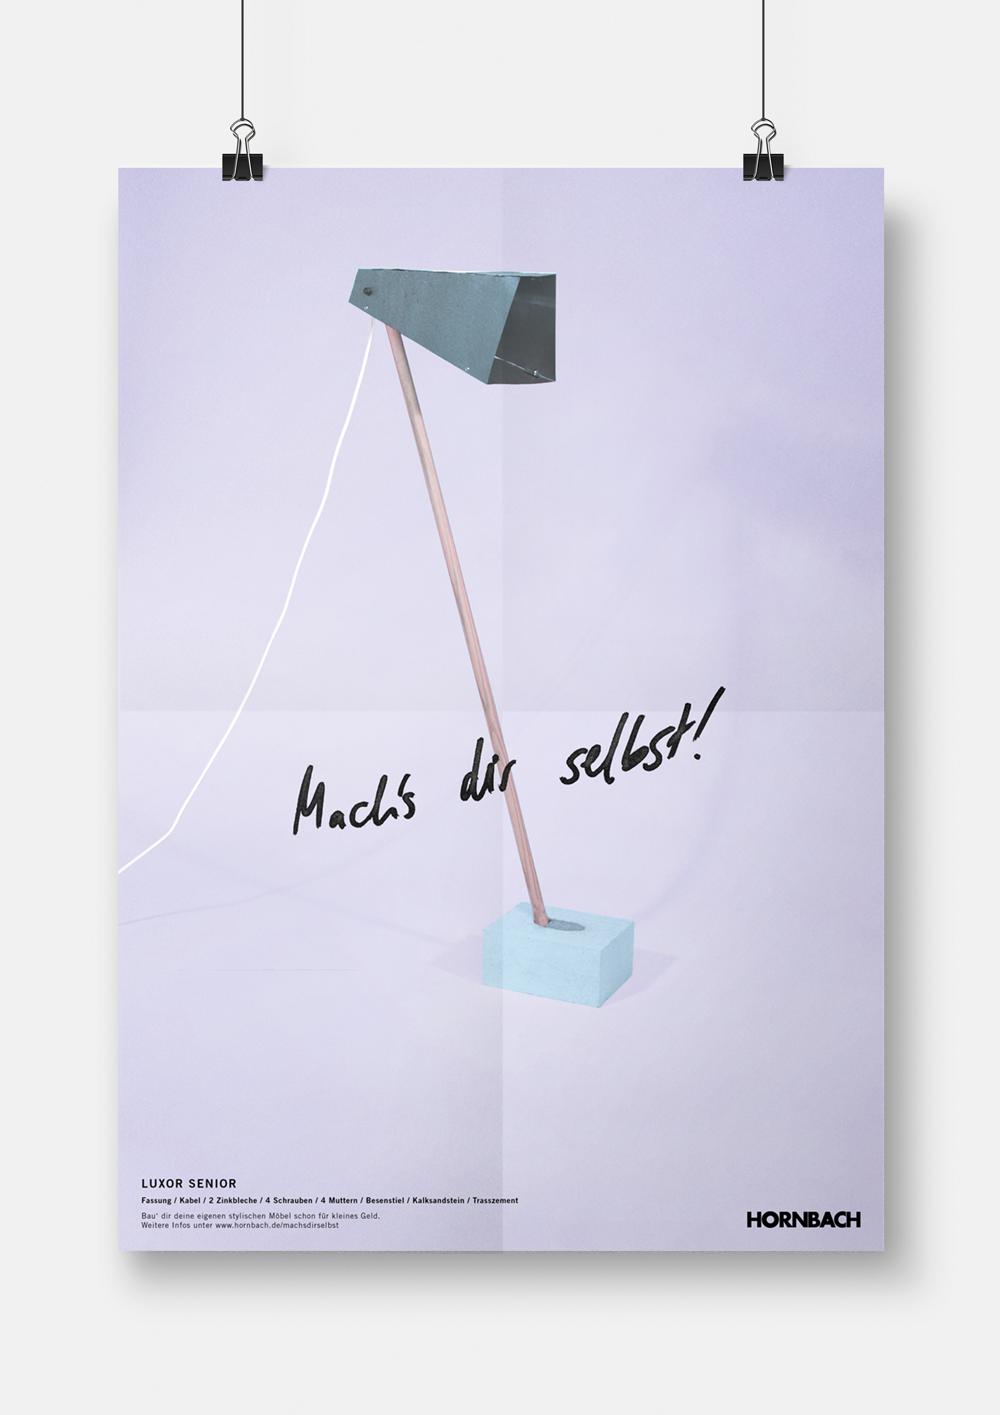 furniture graphic Baumarkt image advert campaign student studio photo Colourful